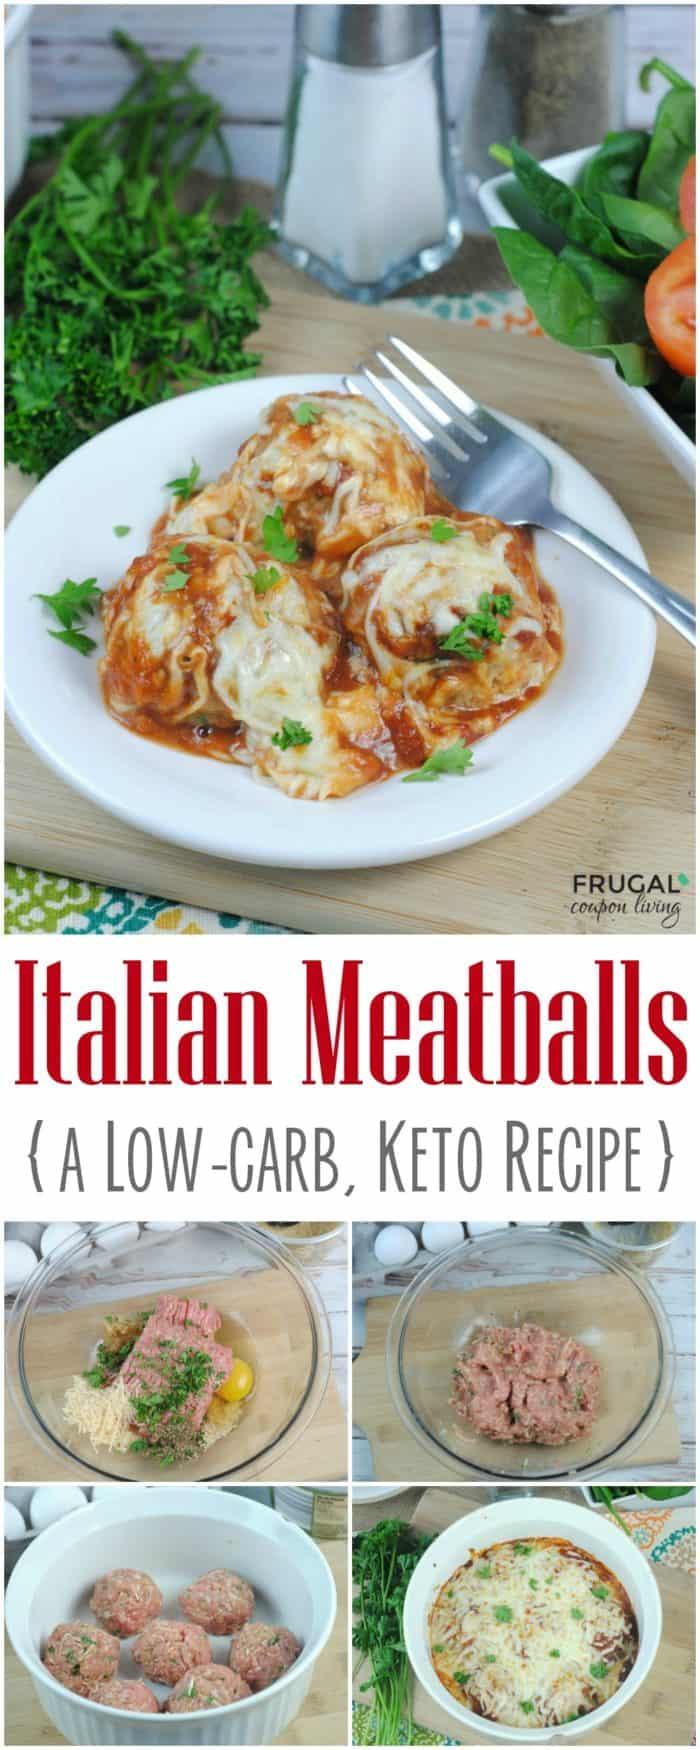 Low Carb Dinner Italian Keto Meatballs